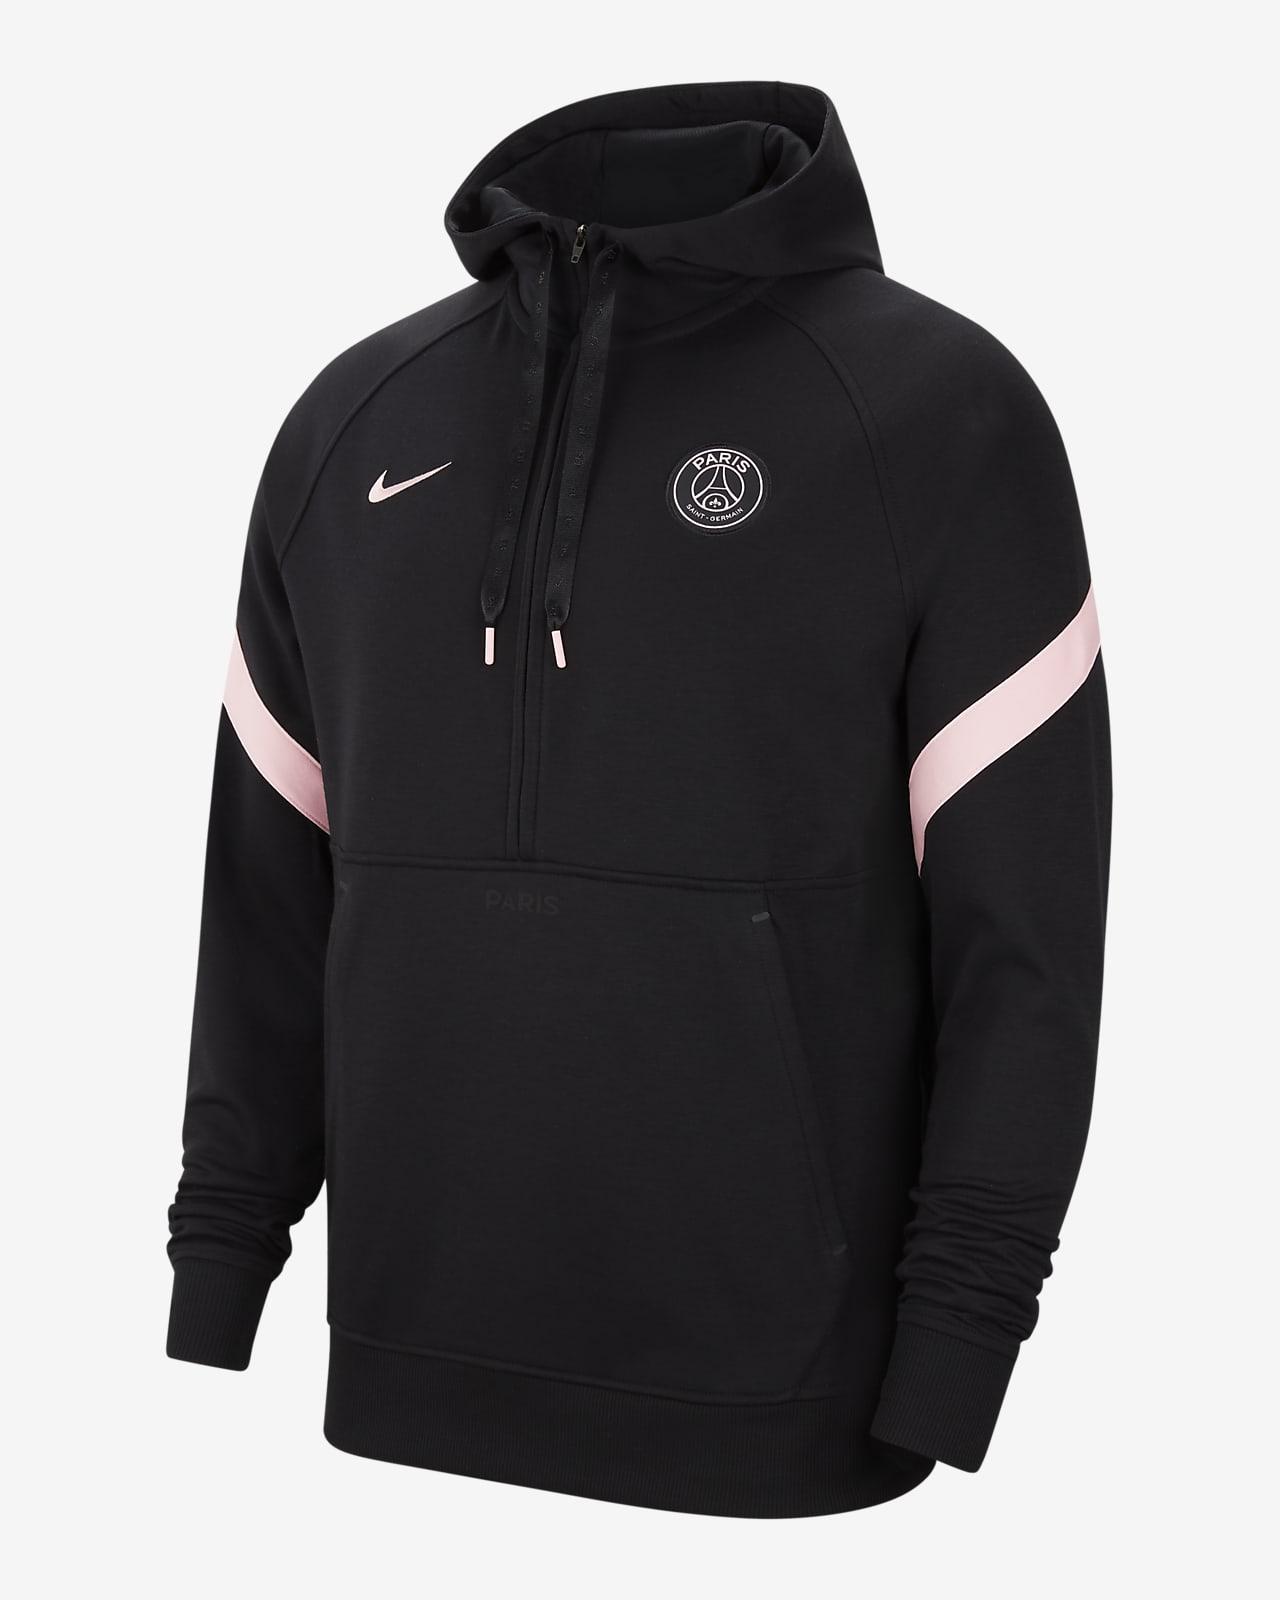 Paris Saint-Germain Men's Nike Dri-FIT Fleece Football Hoodie